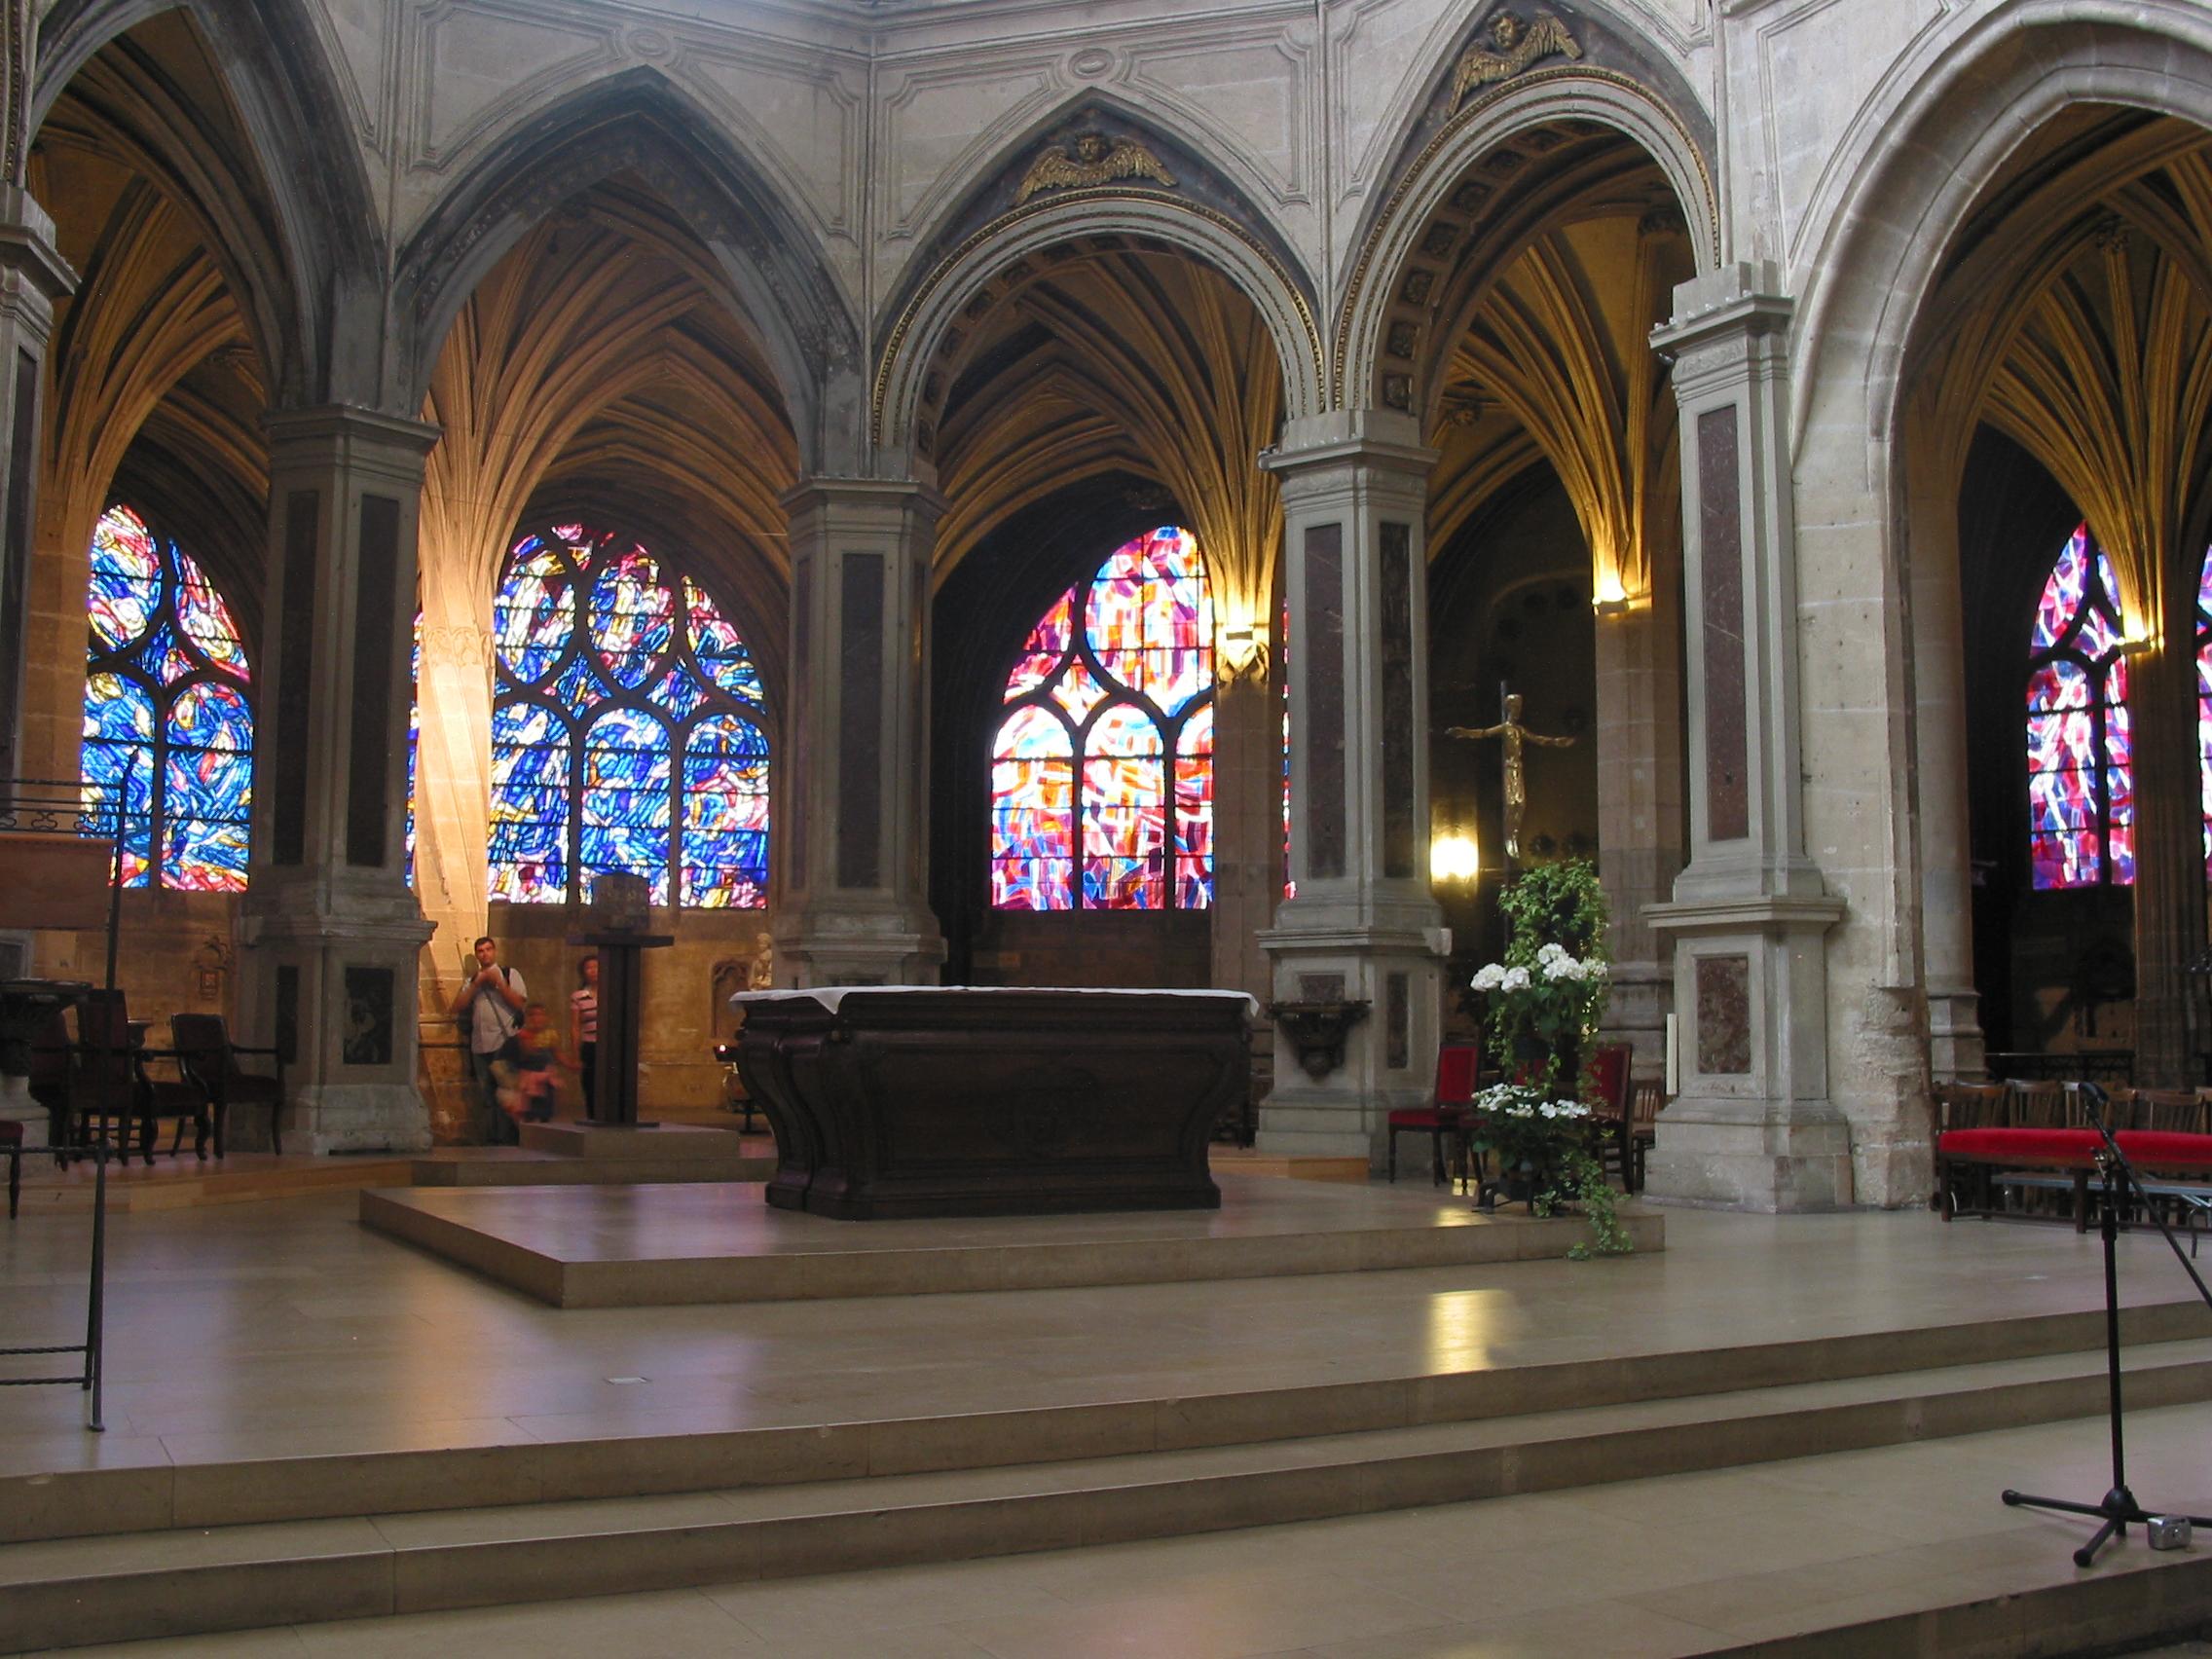 Bon Mercredi Eglise-severin-paris-vitraux-eglise-severin-big